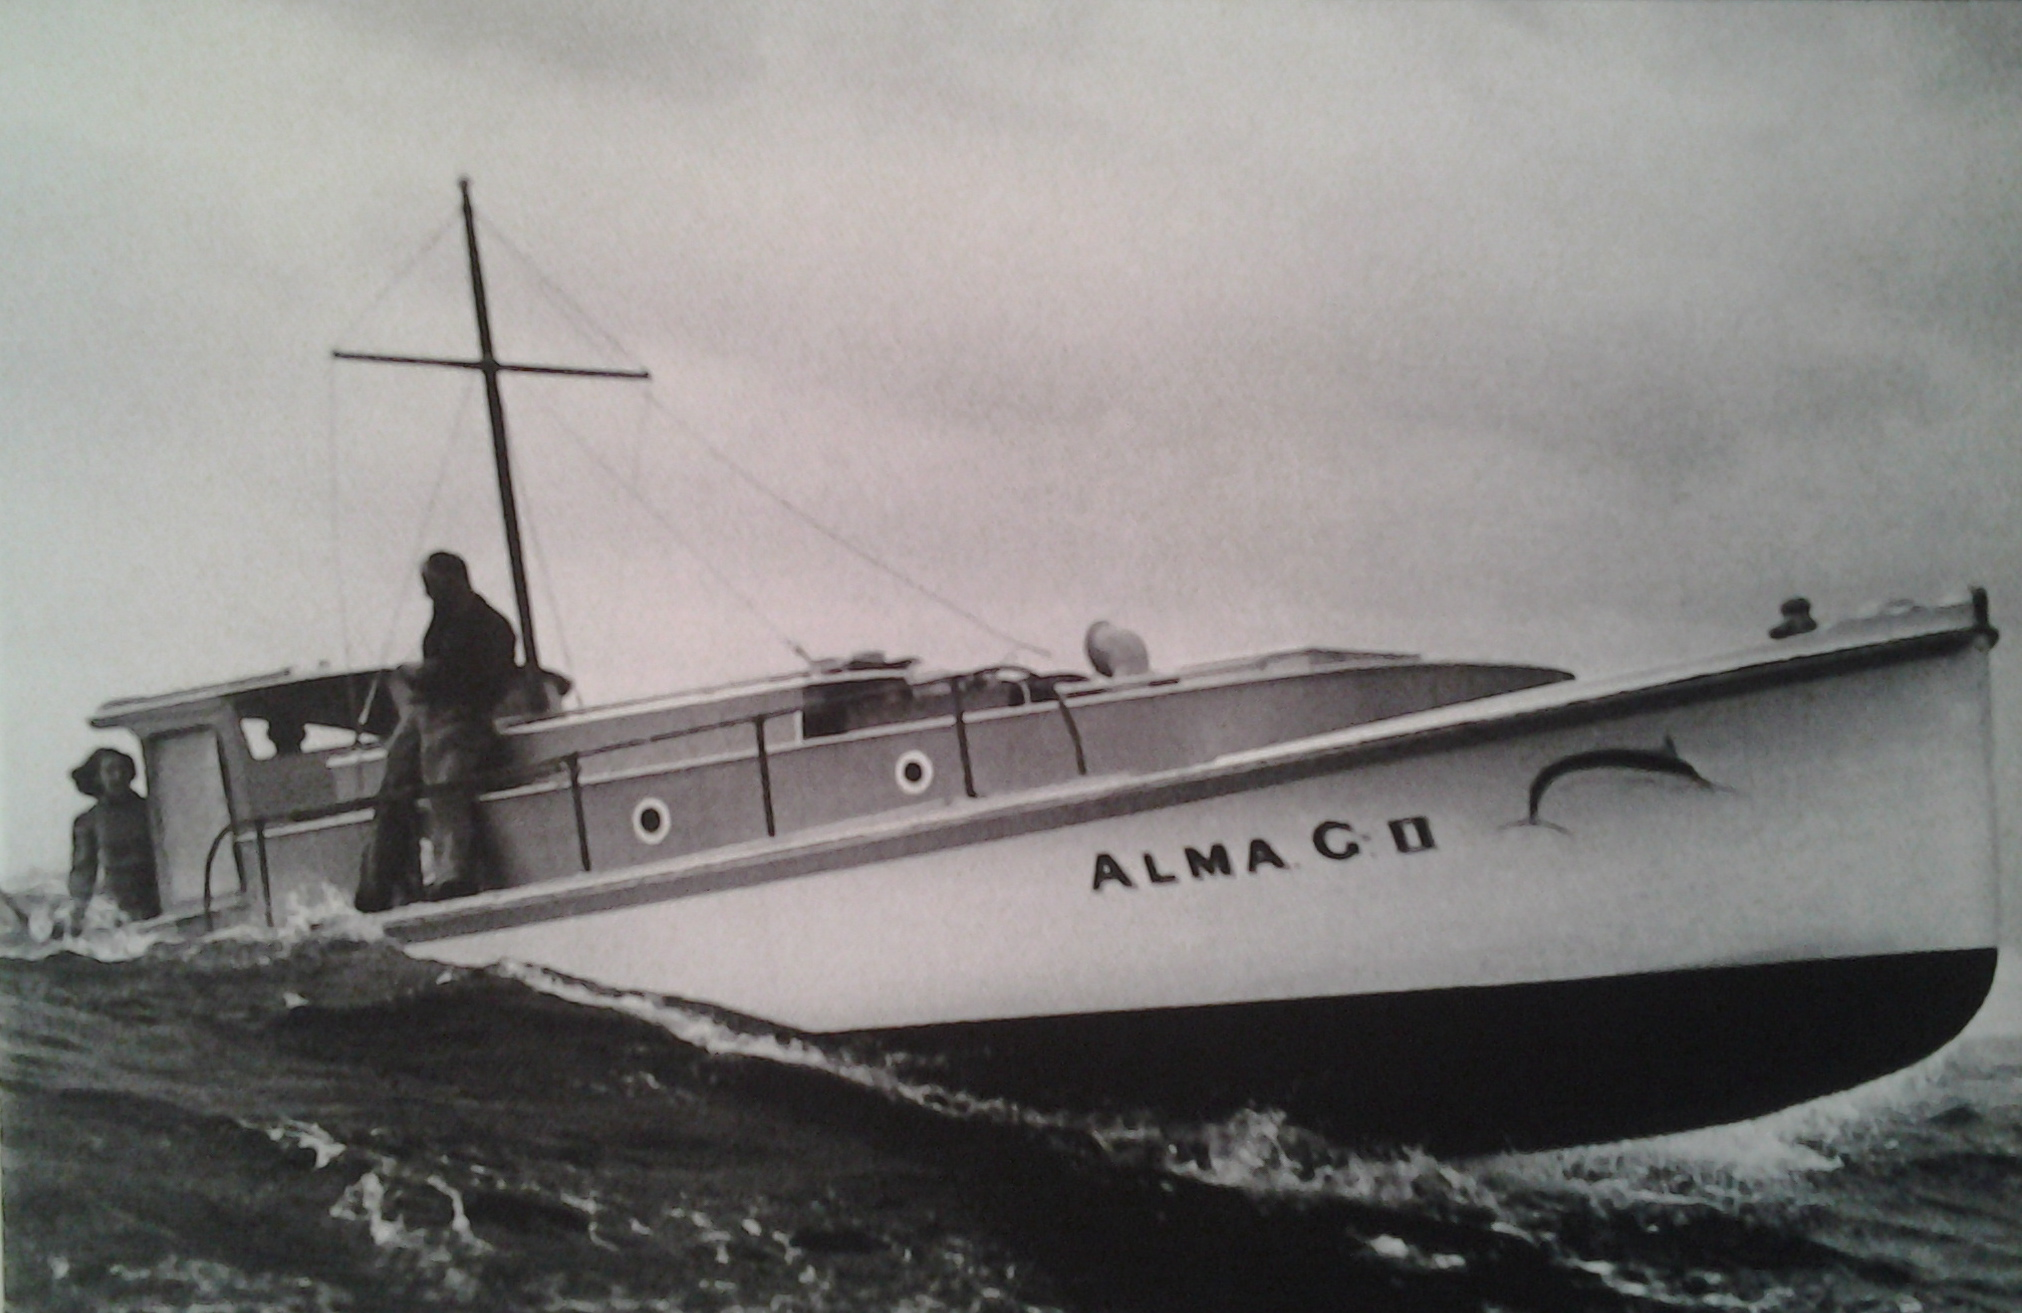 ALMA G II - H Edmonds